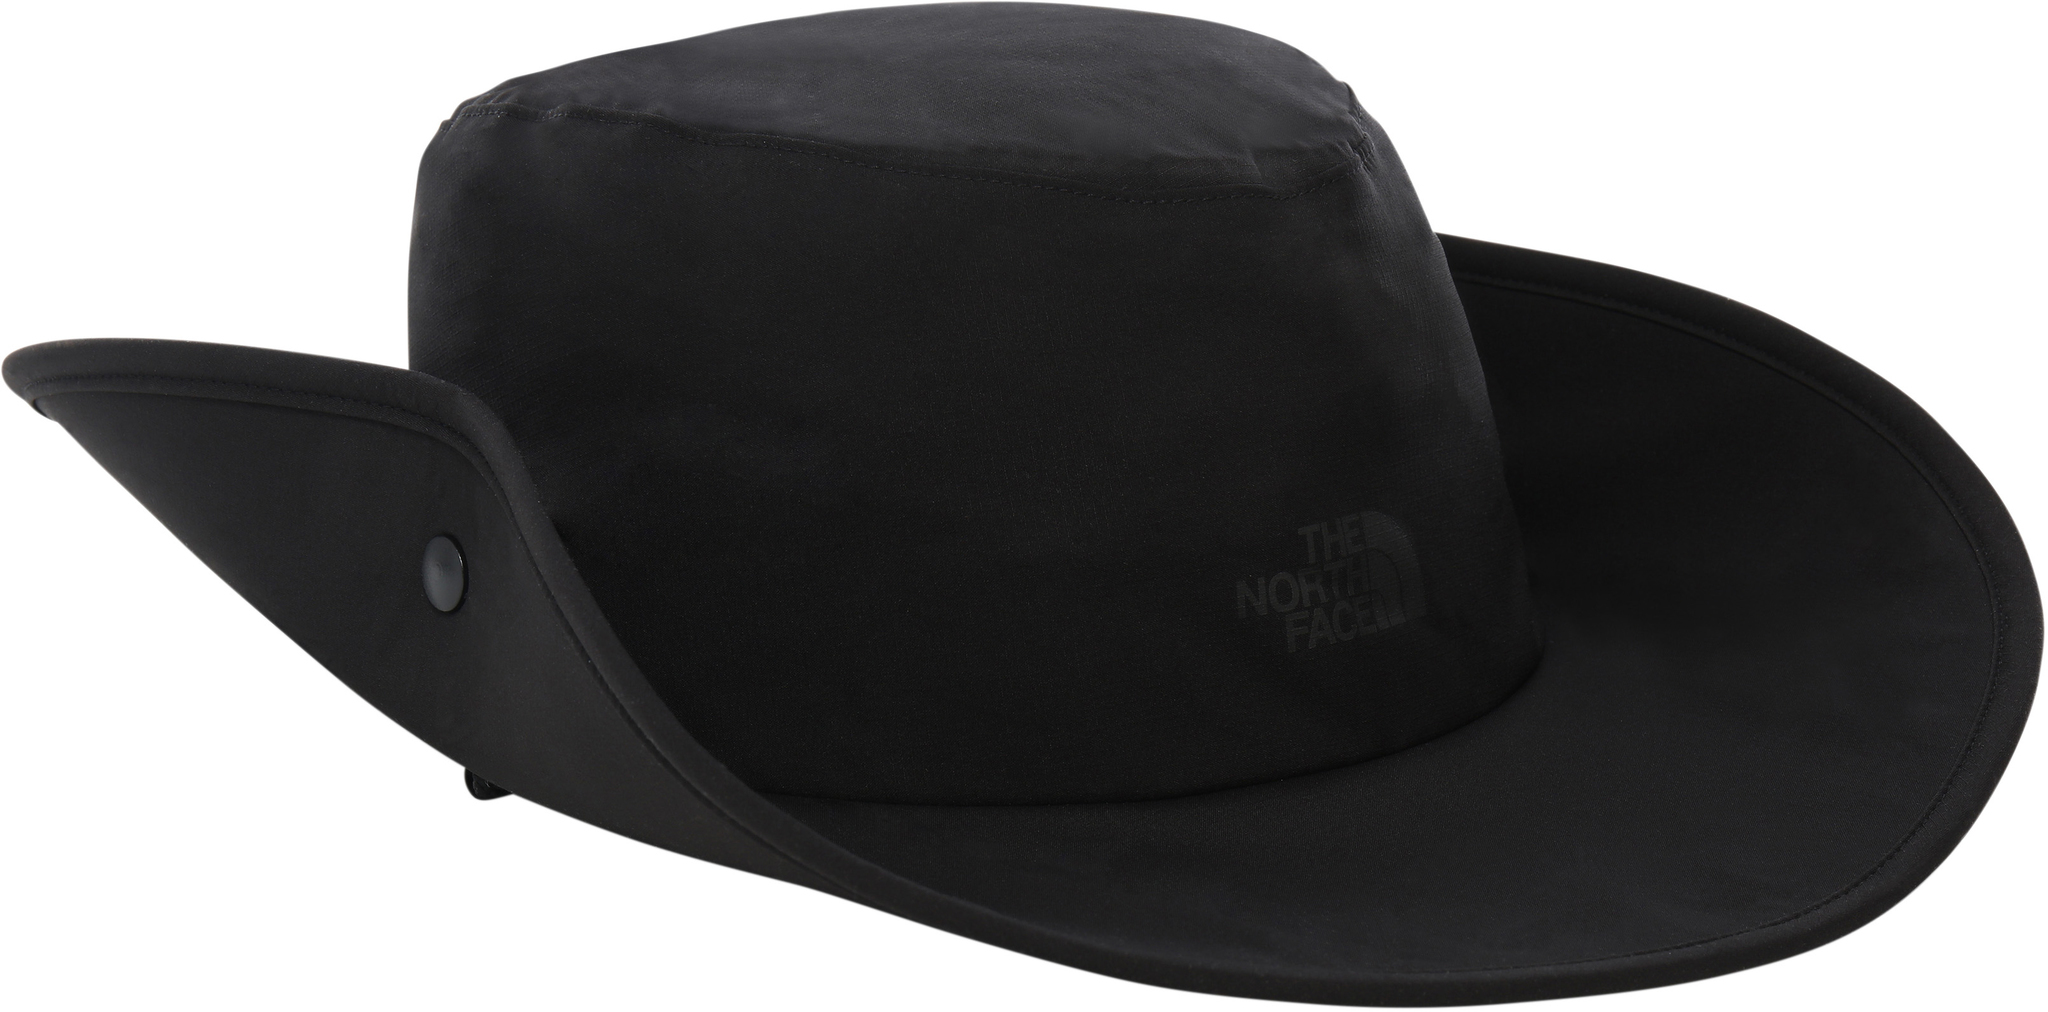 The North Face Шляпа North Face Future Lt Hiker Hat Black 026_HI_3SHF-JK3-4.jpg